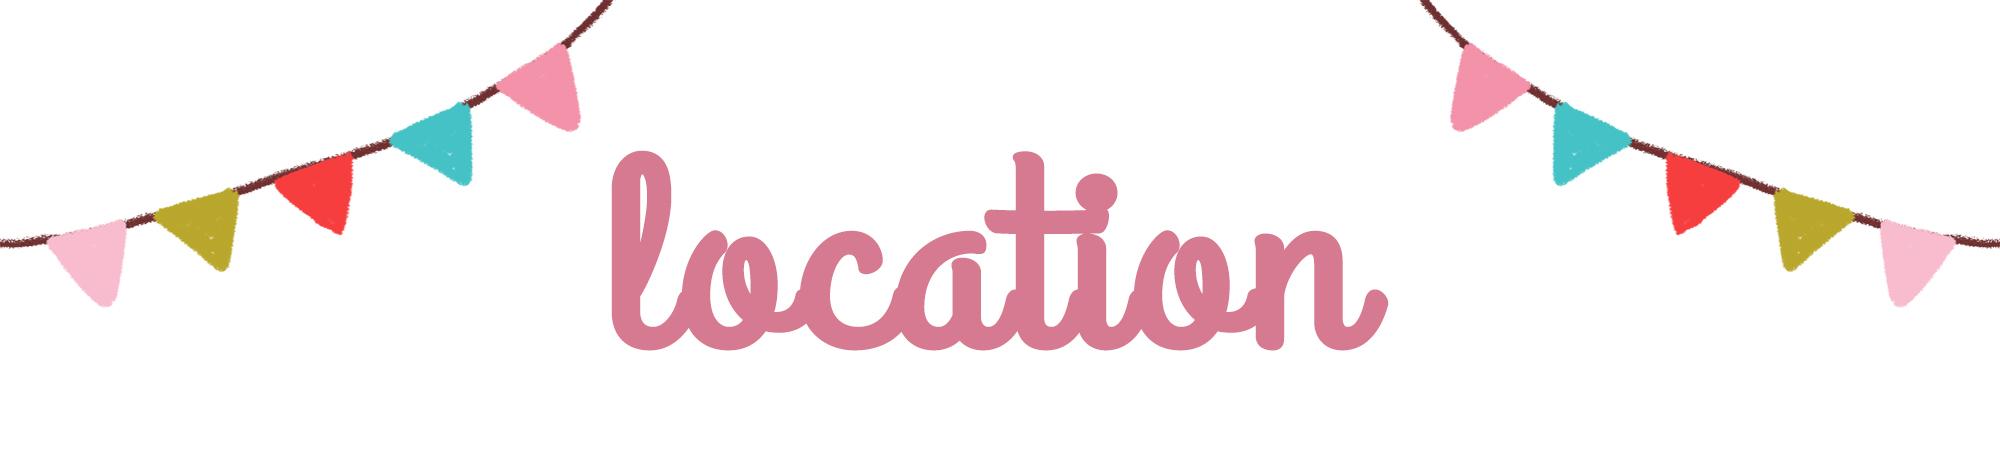 Location banner.jpg